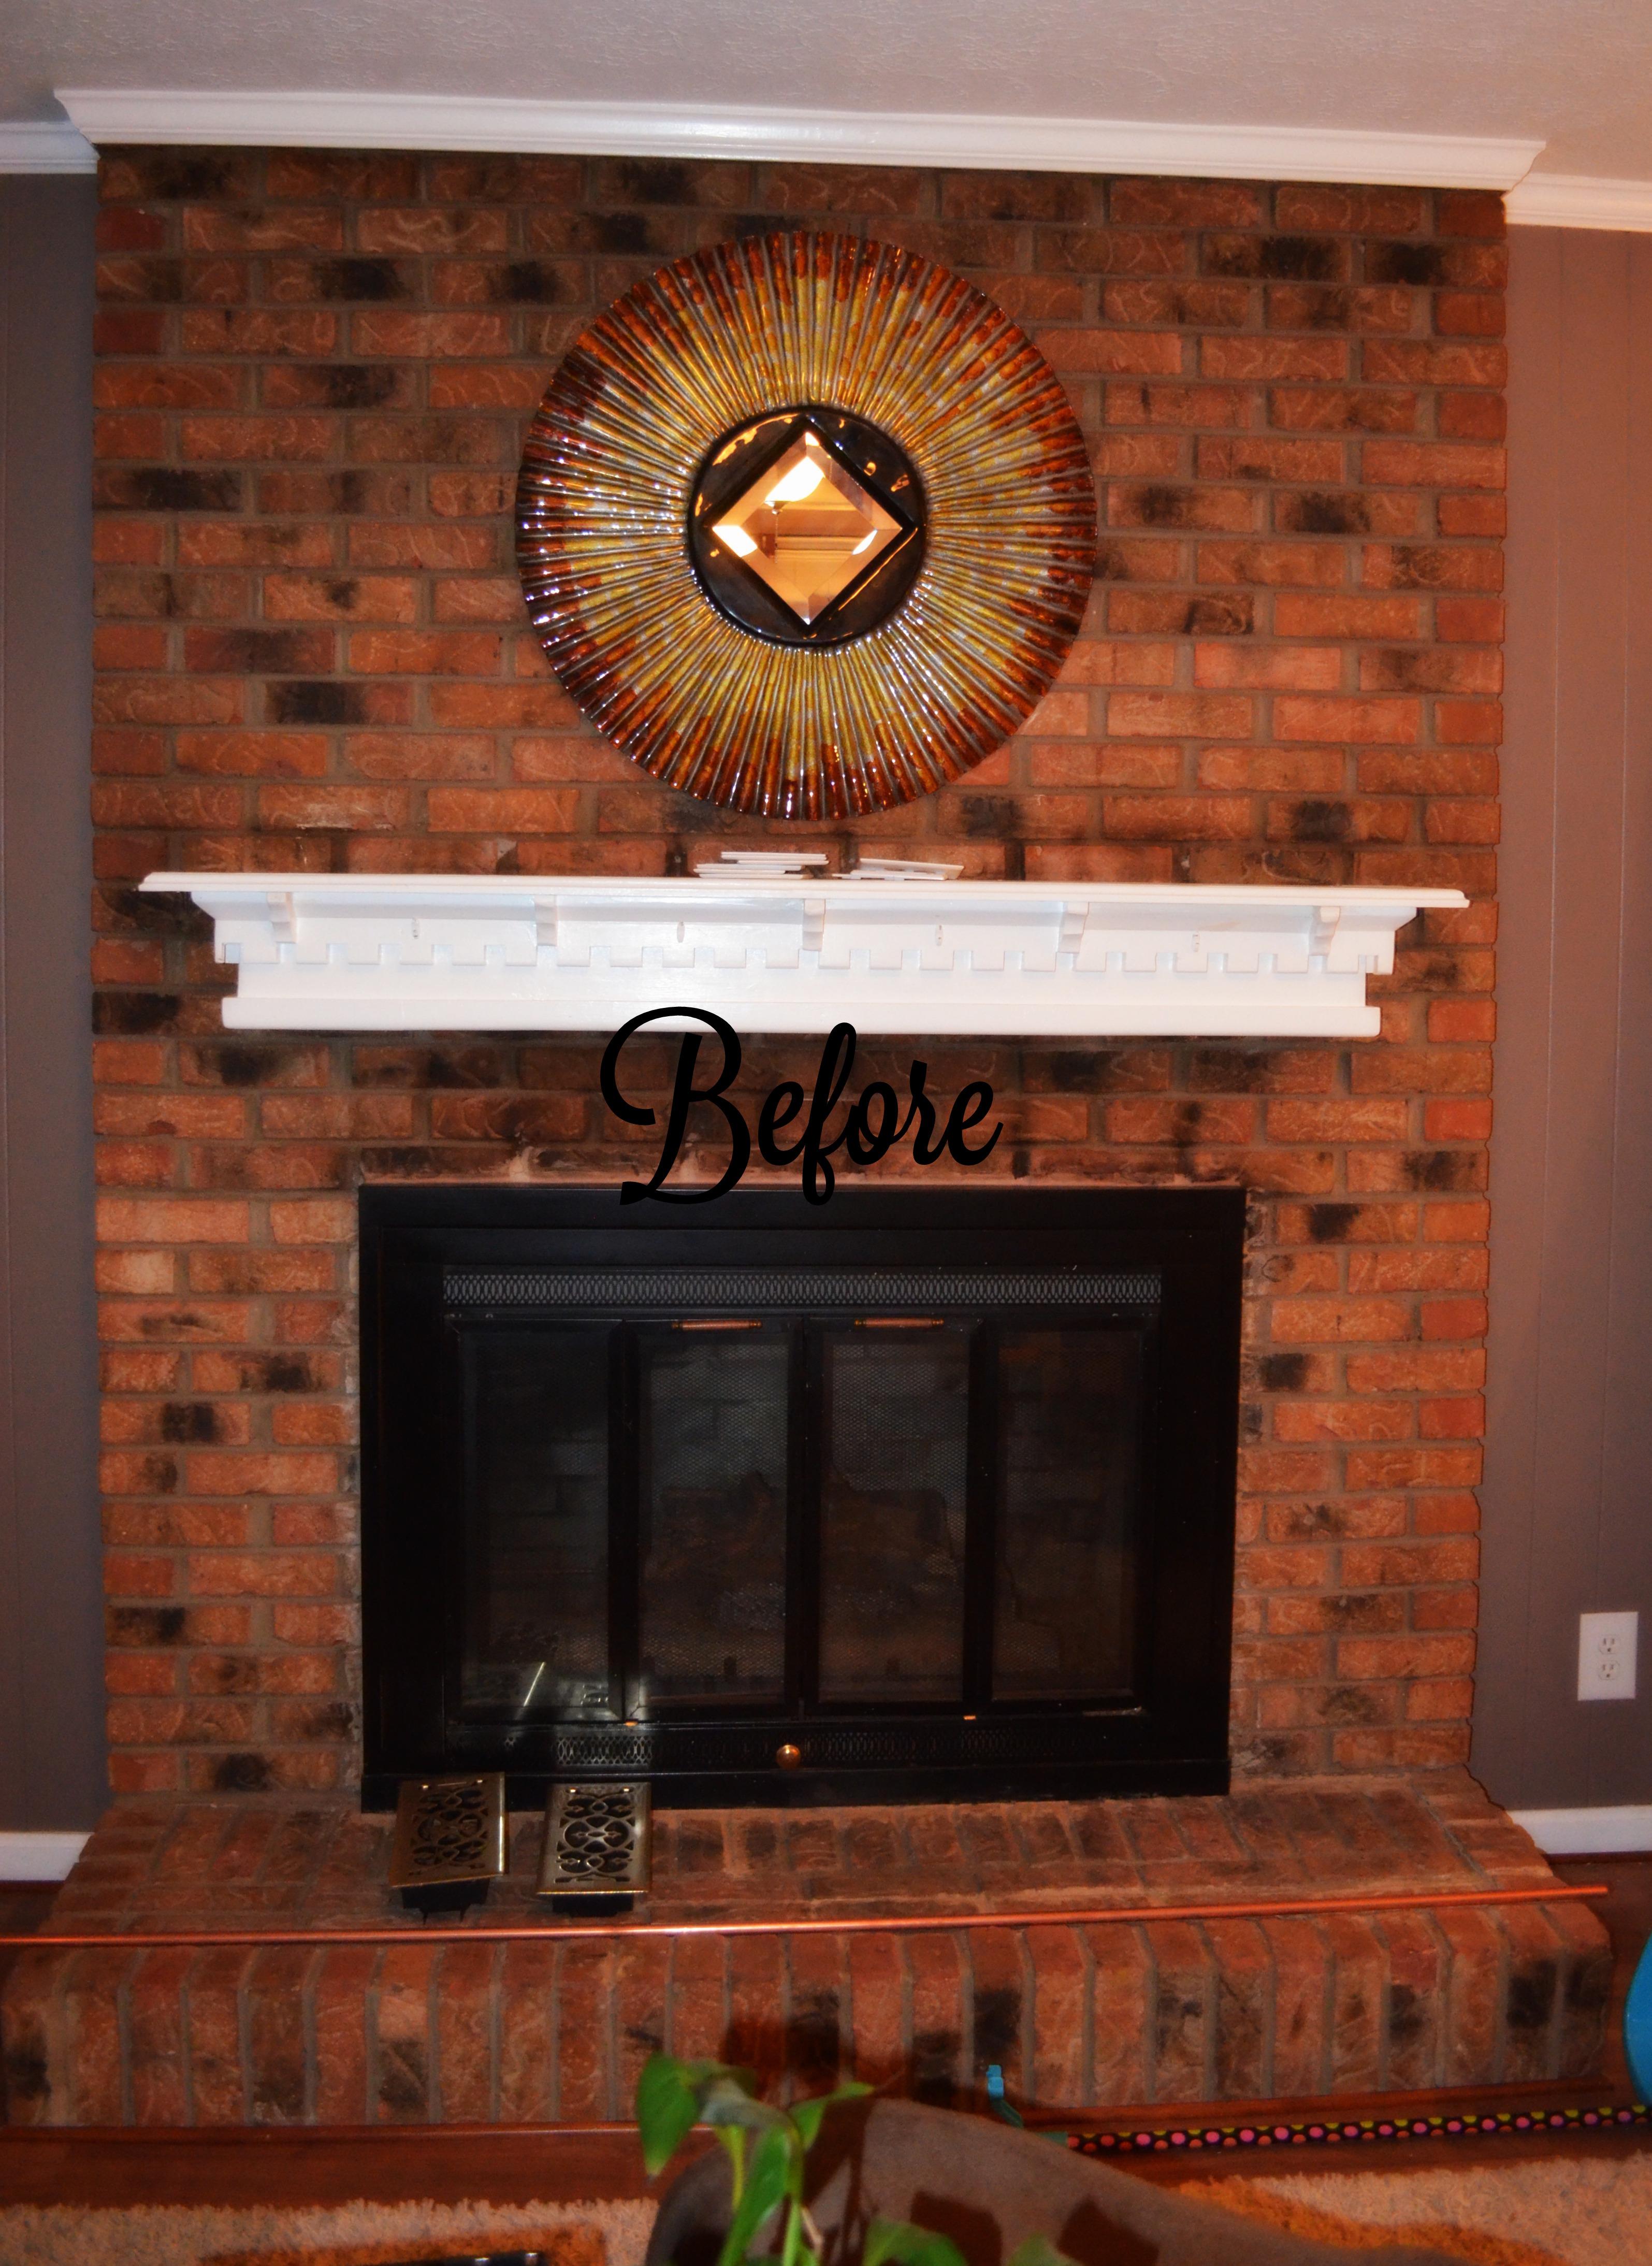 shabby paints - chalk-acrylic painted fireplace brick